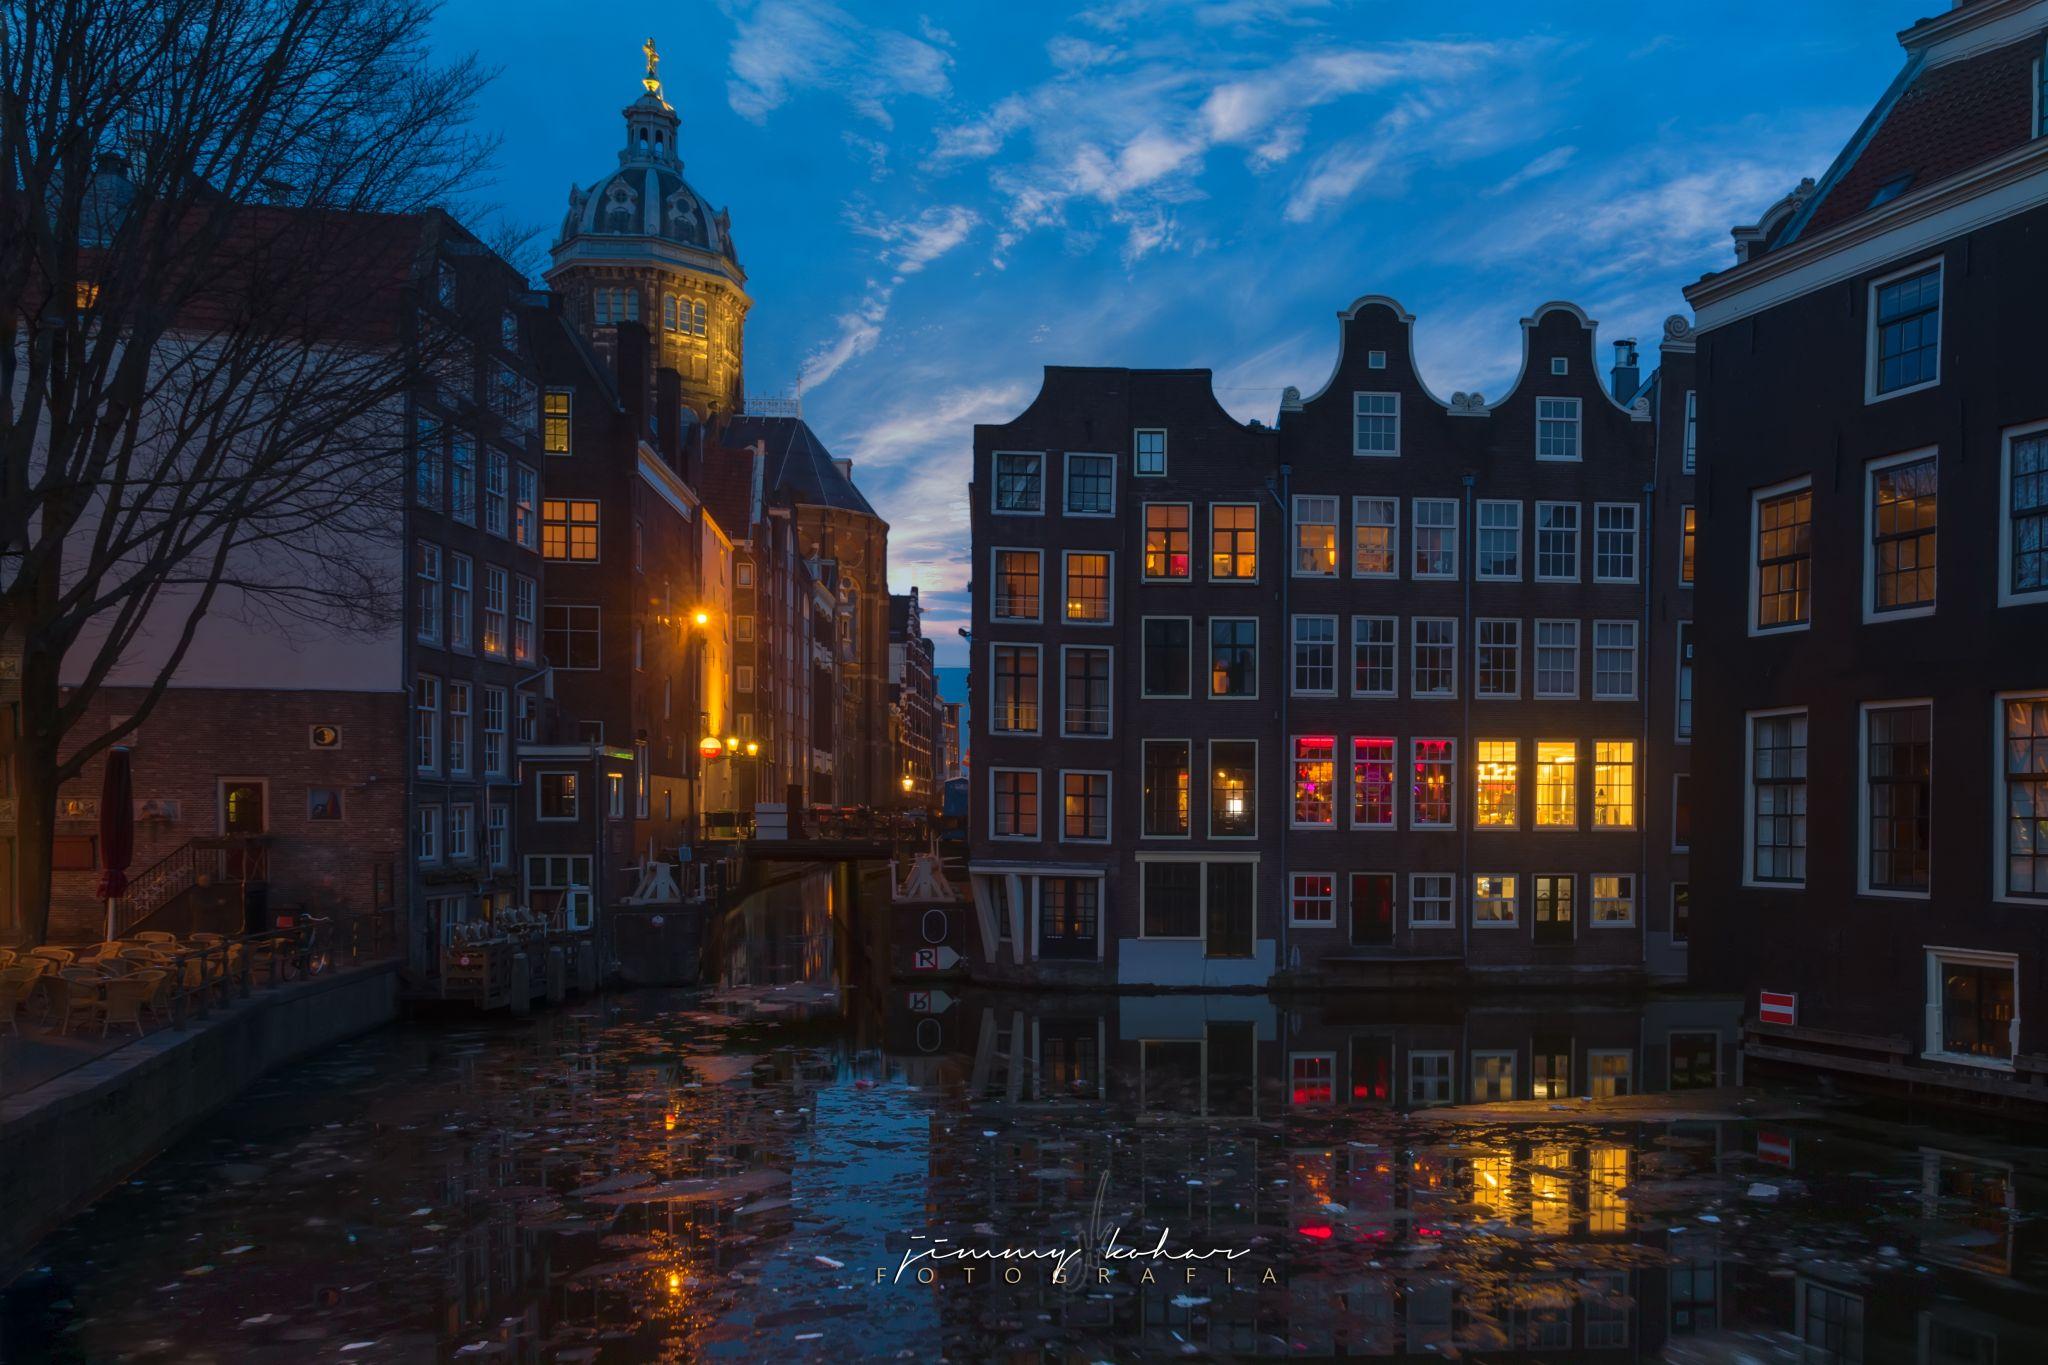 Oudezijds Voorburgwal, Amsterdam Central, Netherlands